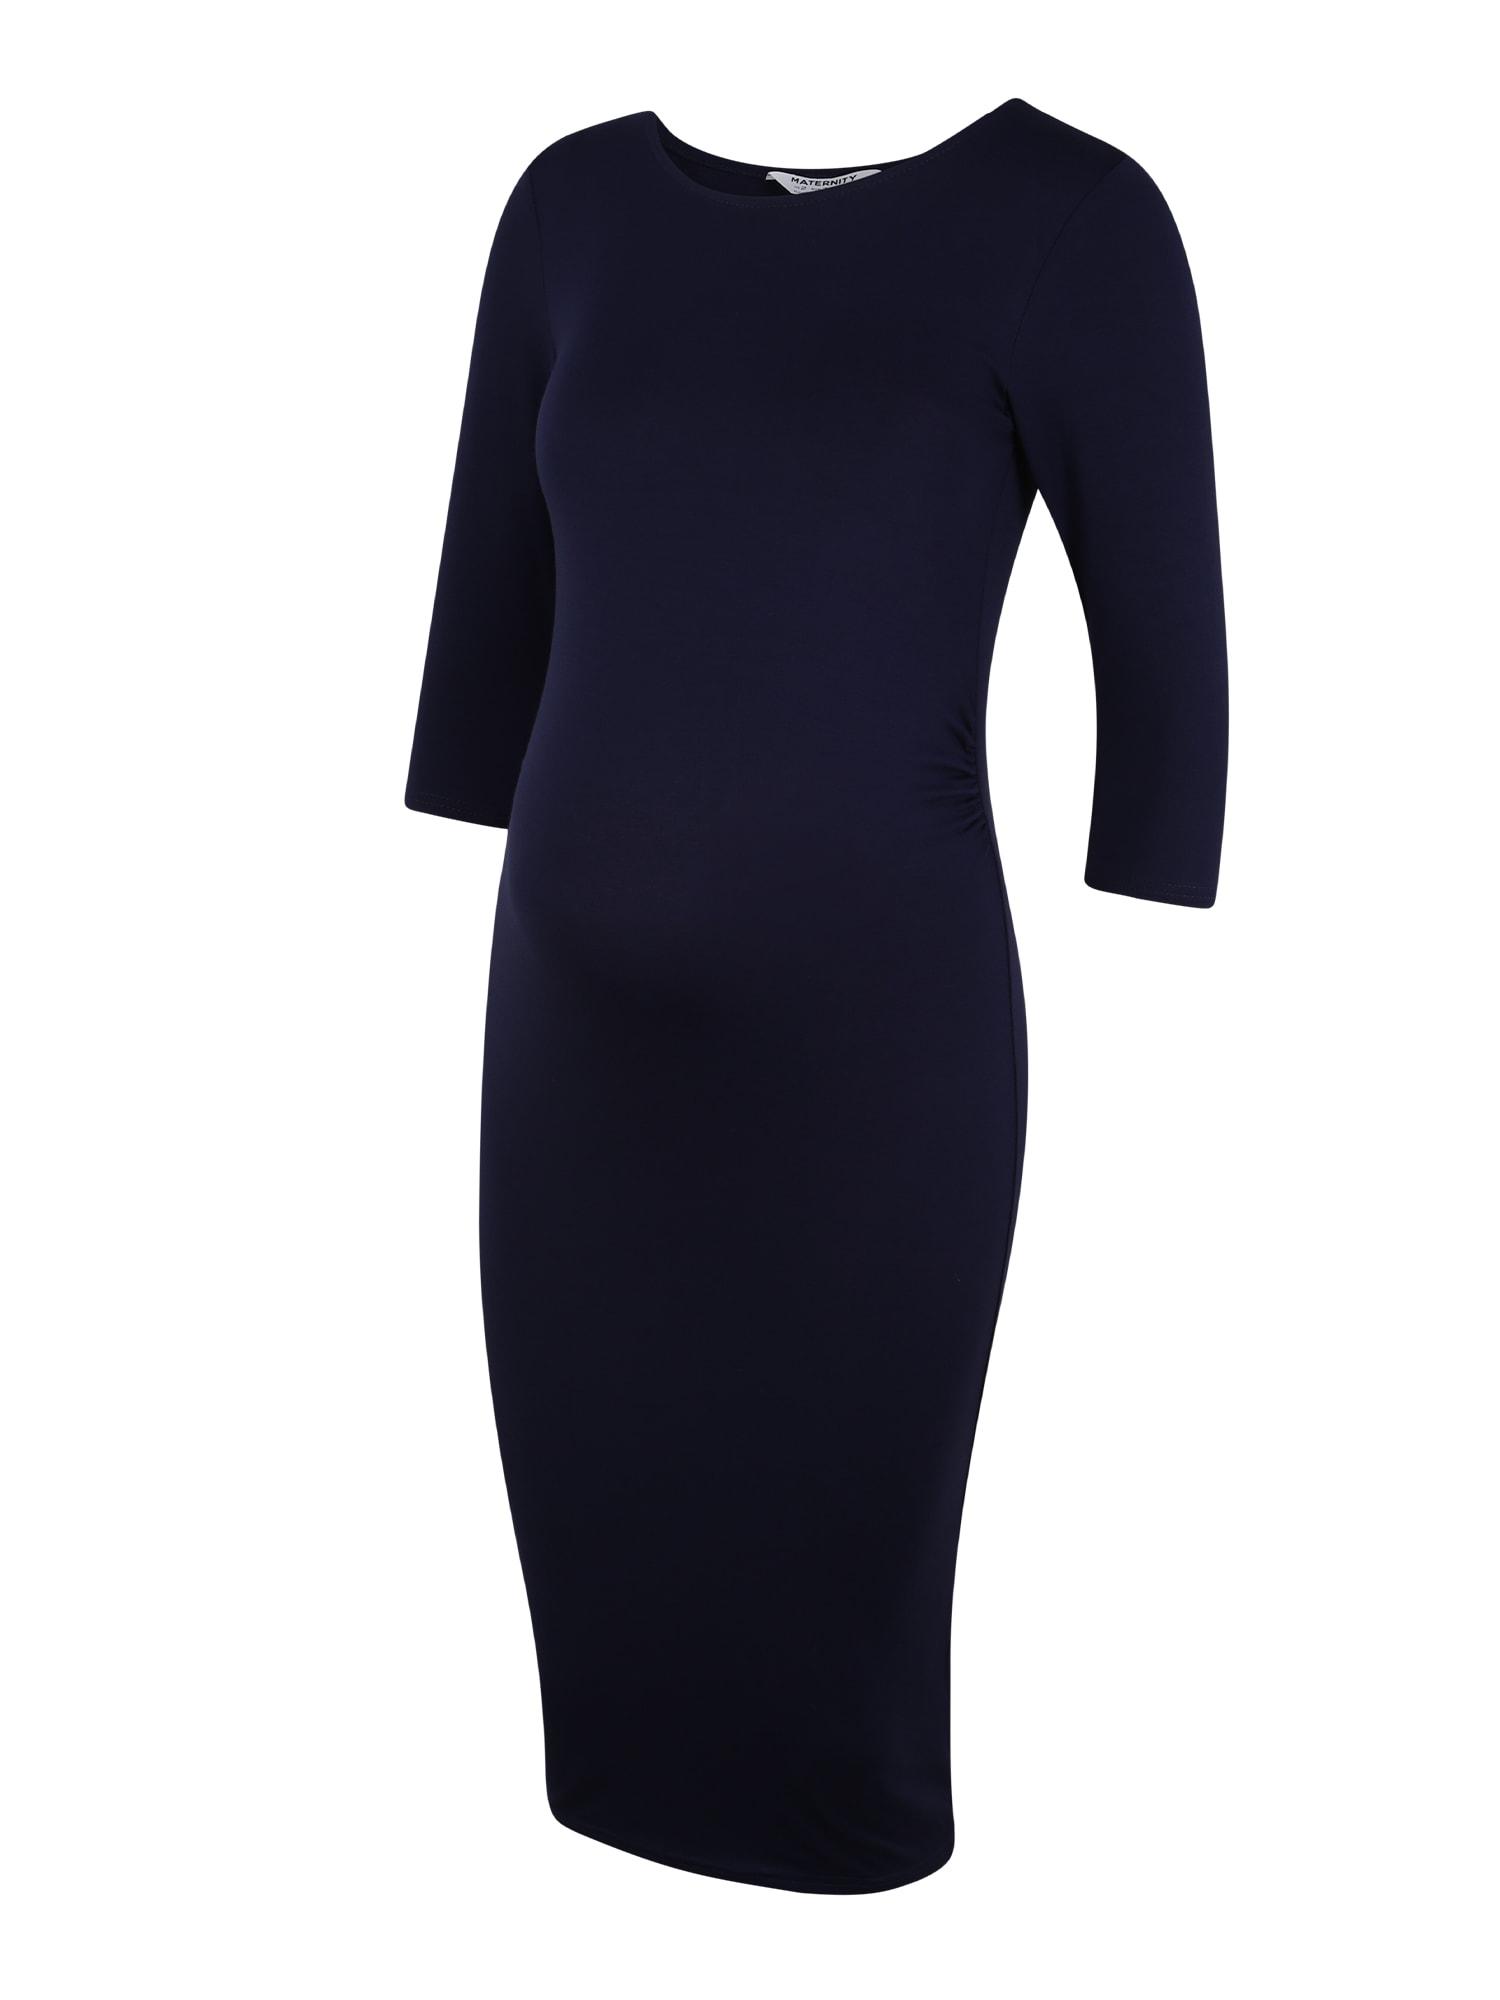 Dorothy Perkins Maternity Suknelė tamsiai mėlyna